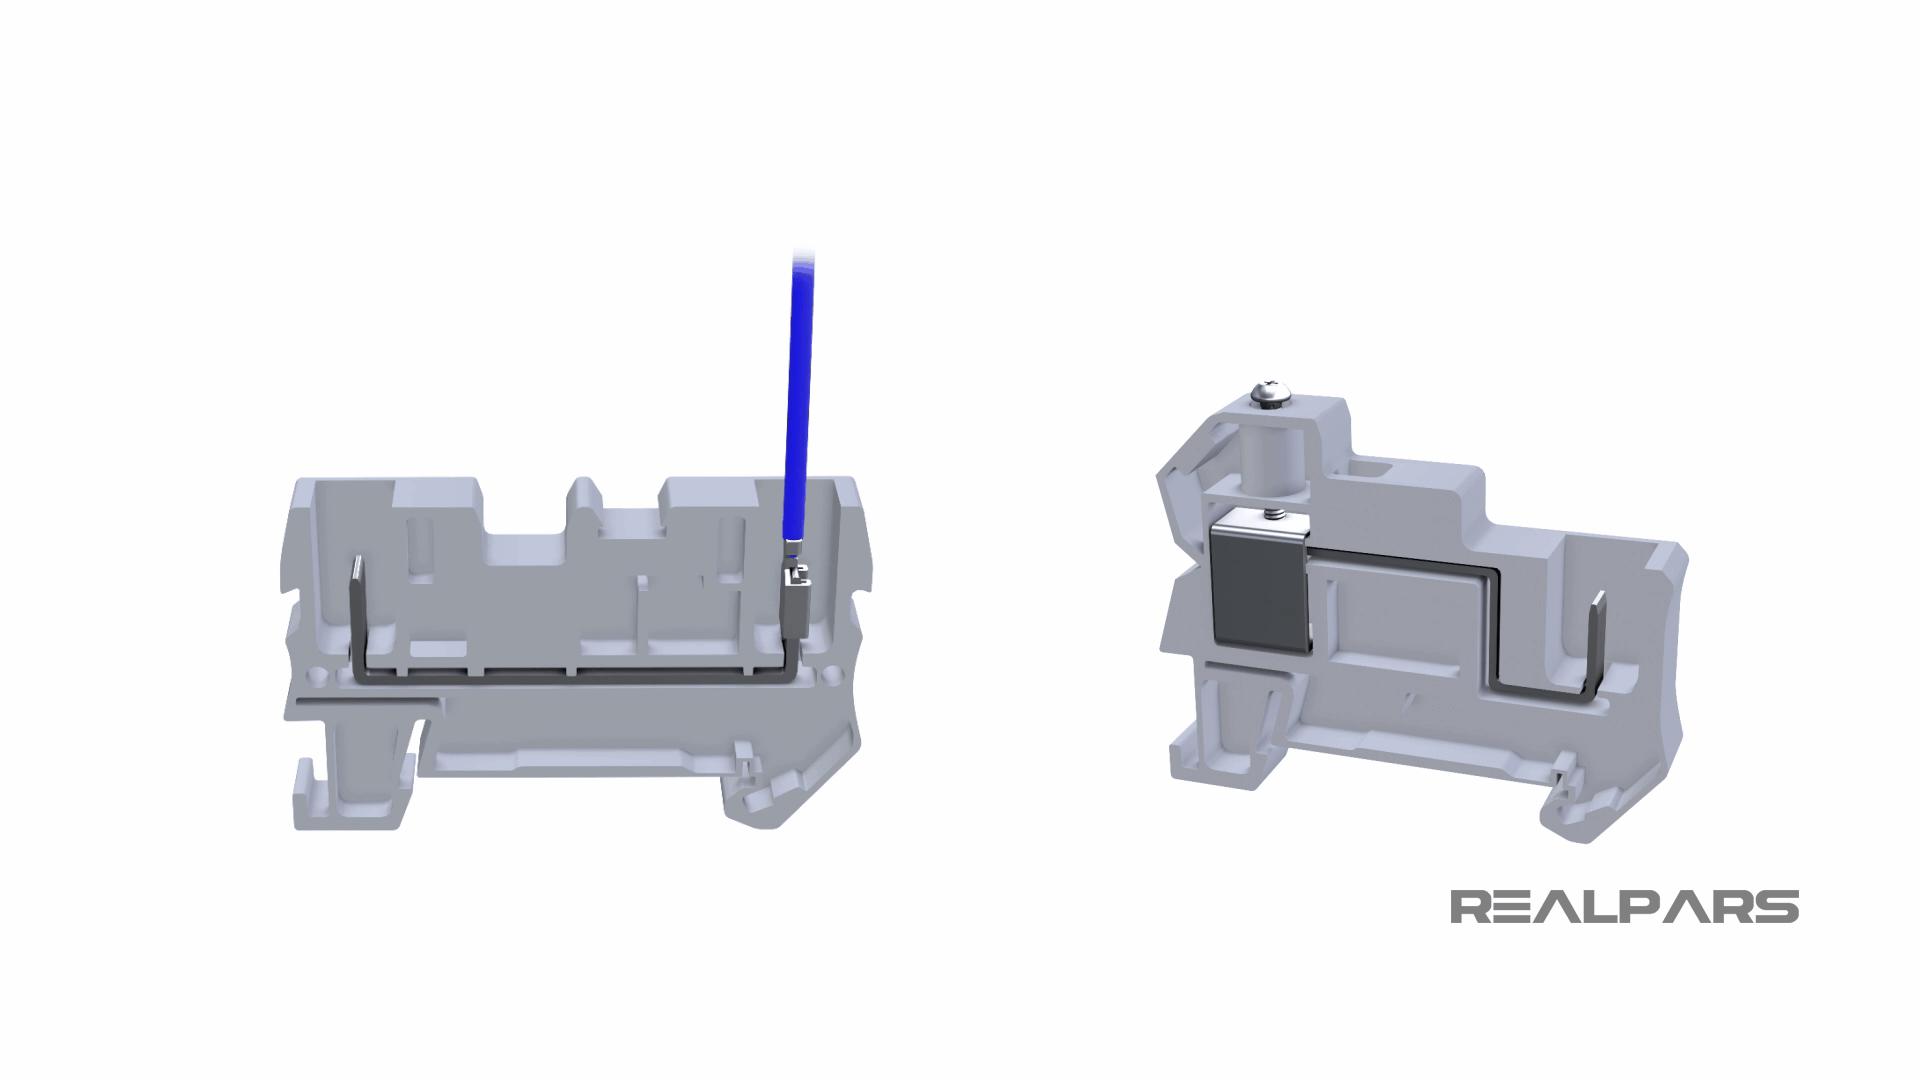 Tab Connector terminal blocks